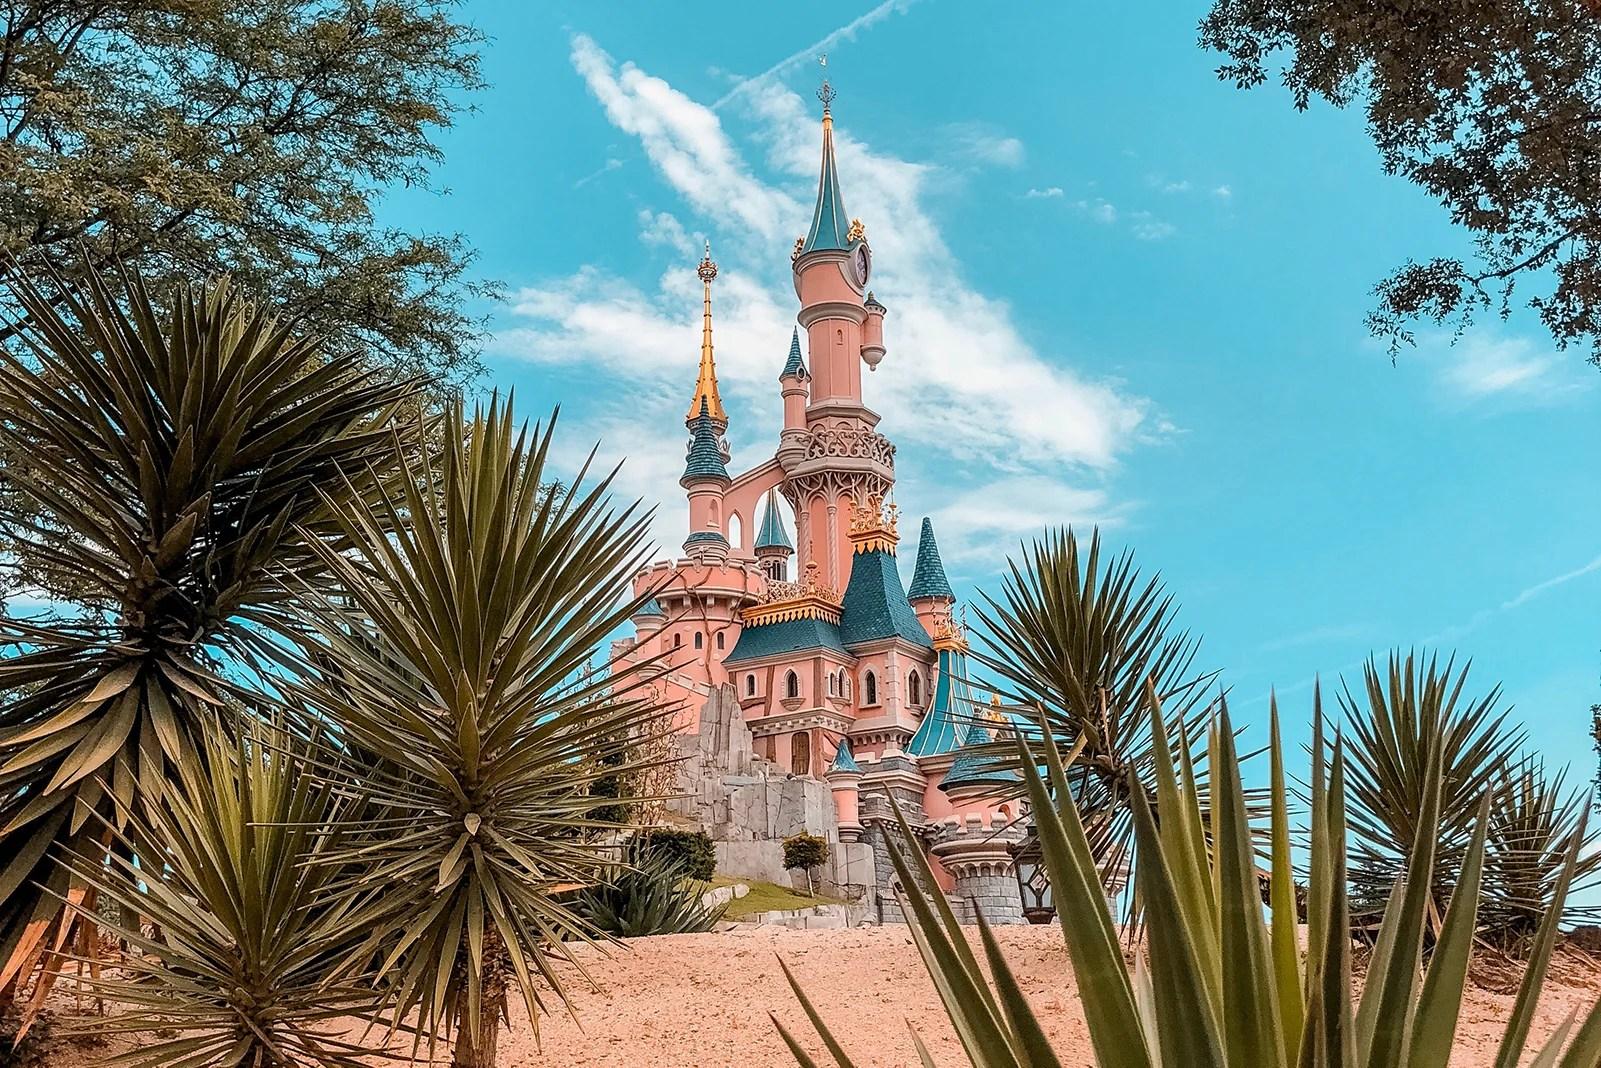 Disneyland Paris to Ban Plastic Straws, Plastic Bags and More